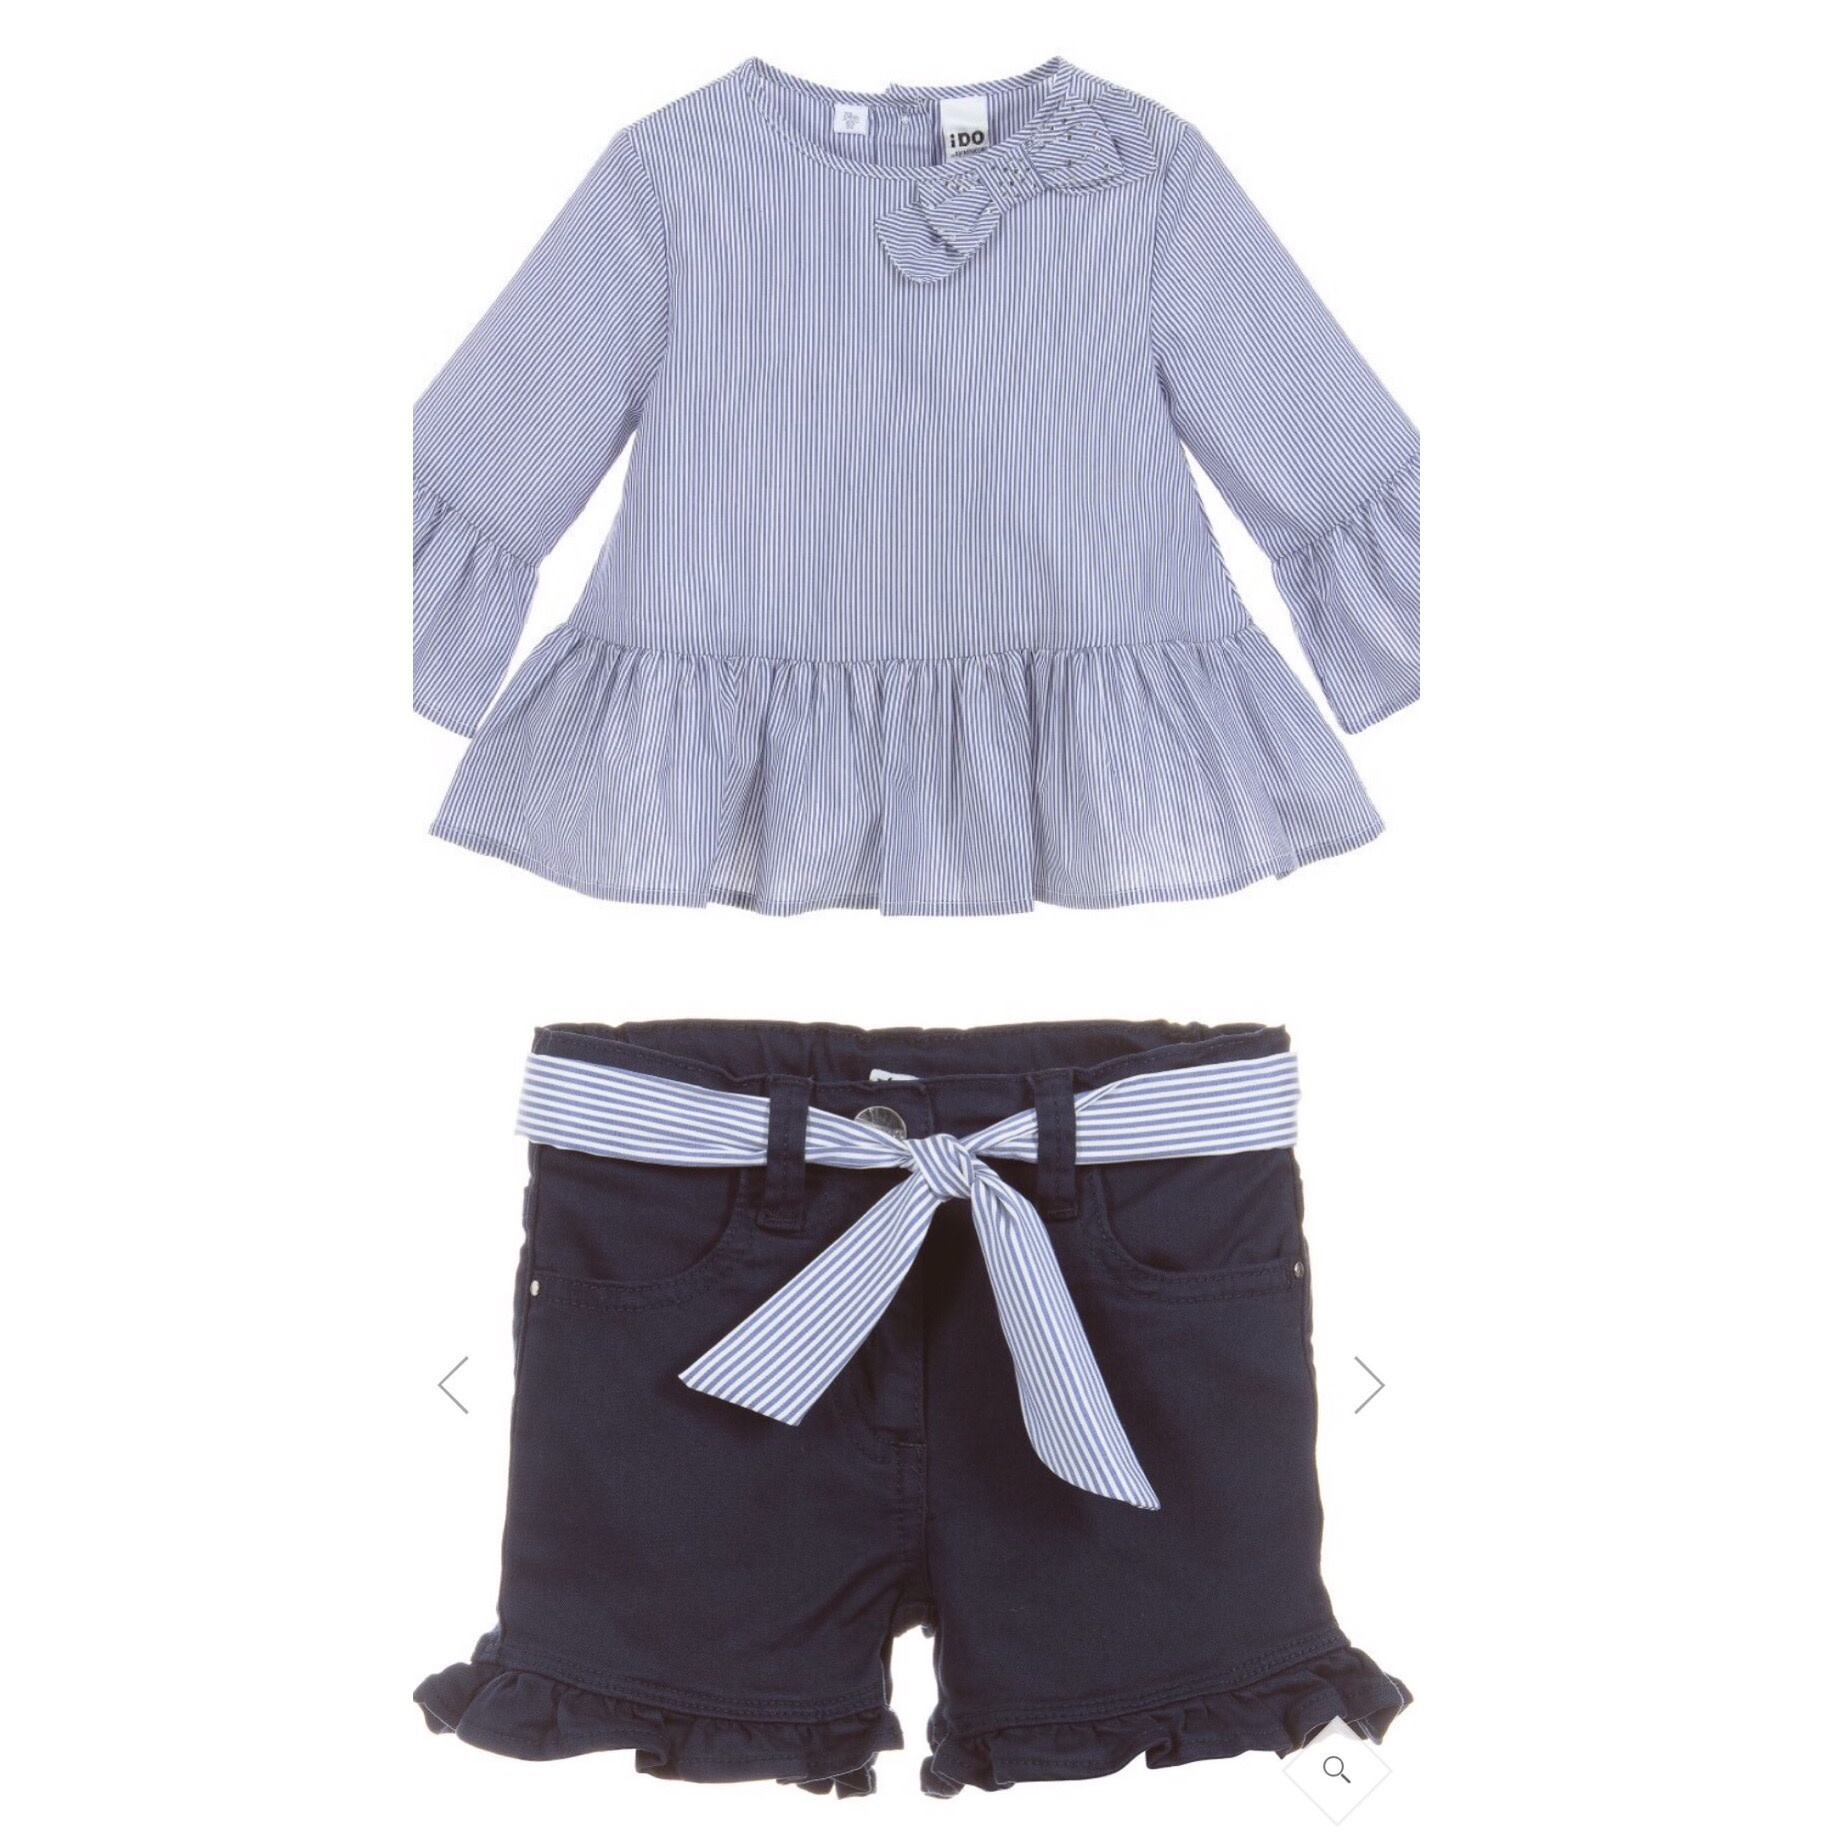 Ido IDo Girls Blue Striped Cotton Blouse & Short Set